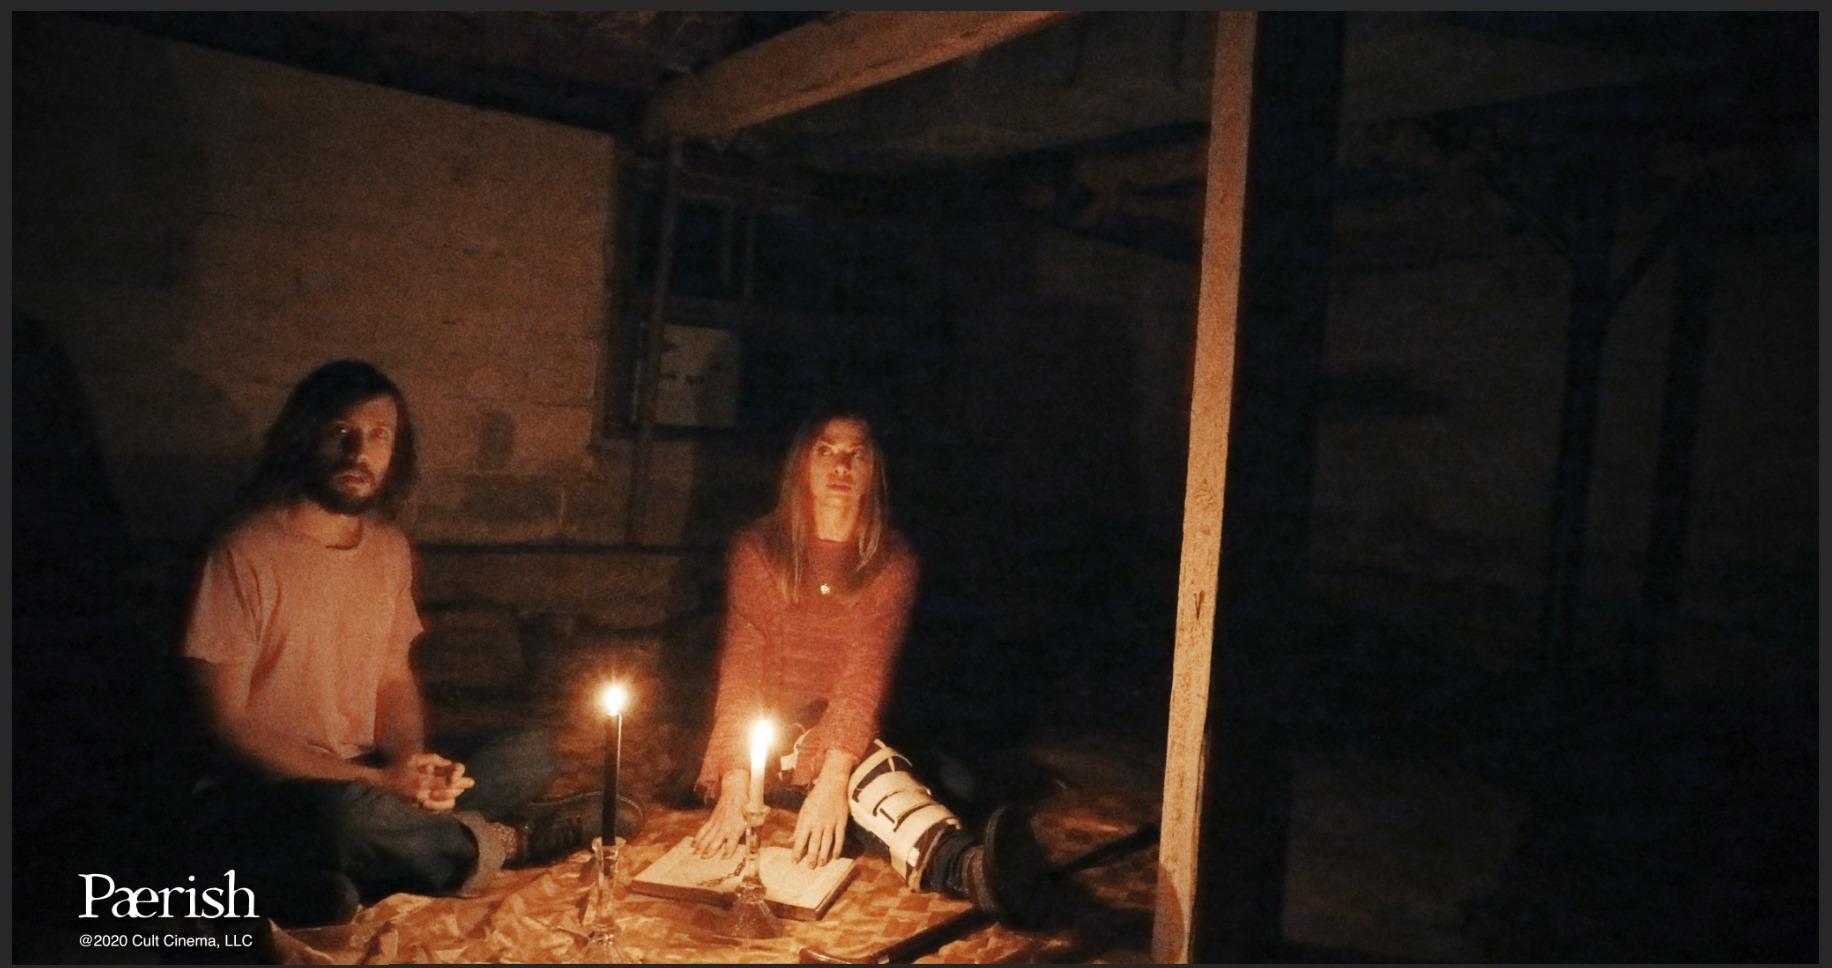 The Curse of Aurore Gagnon image film